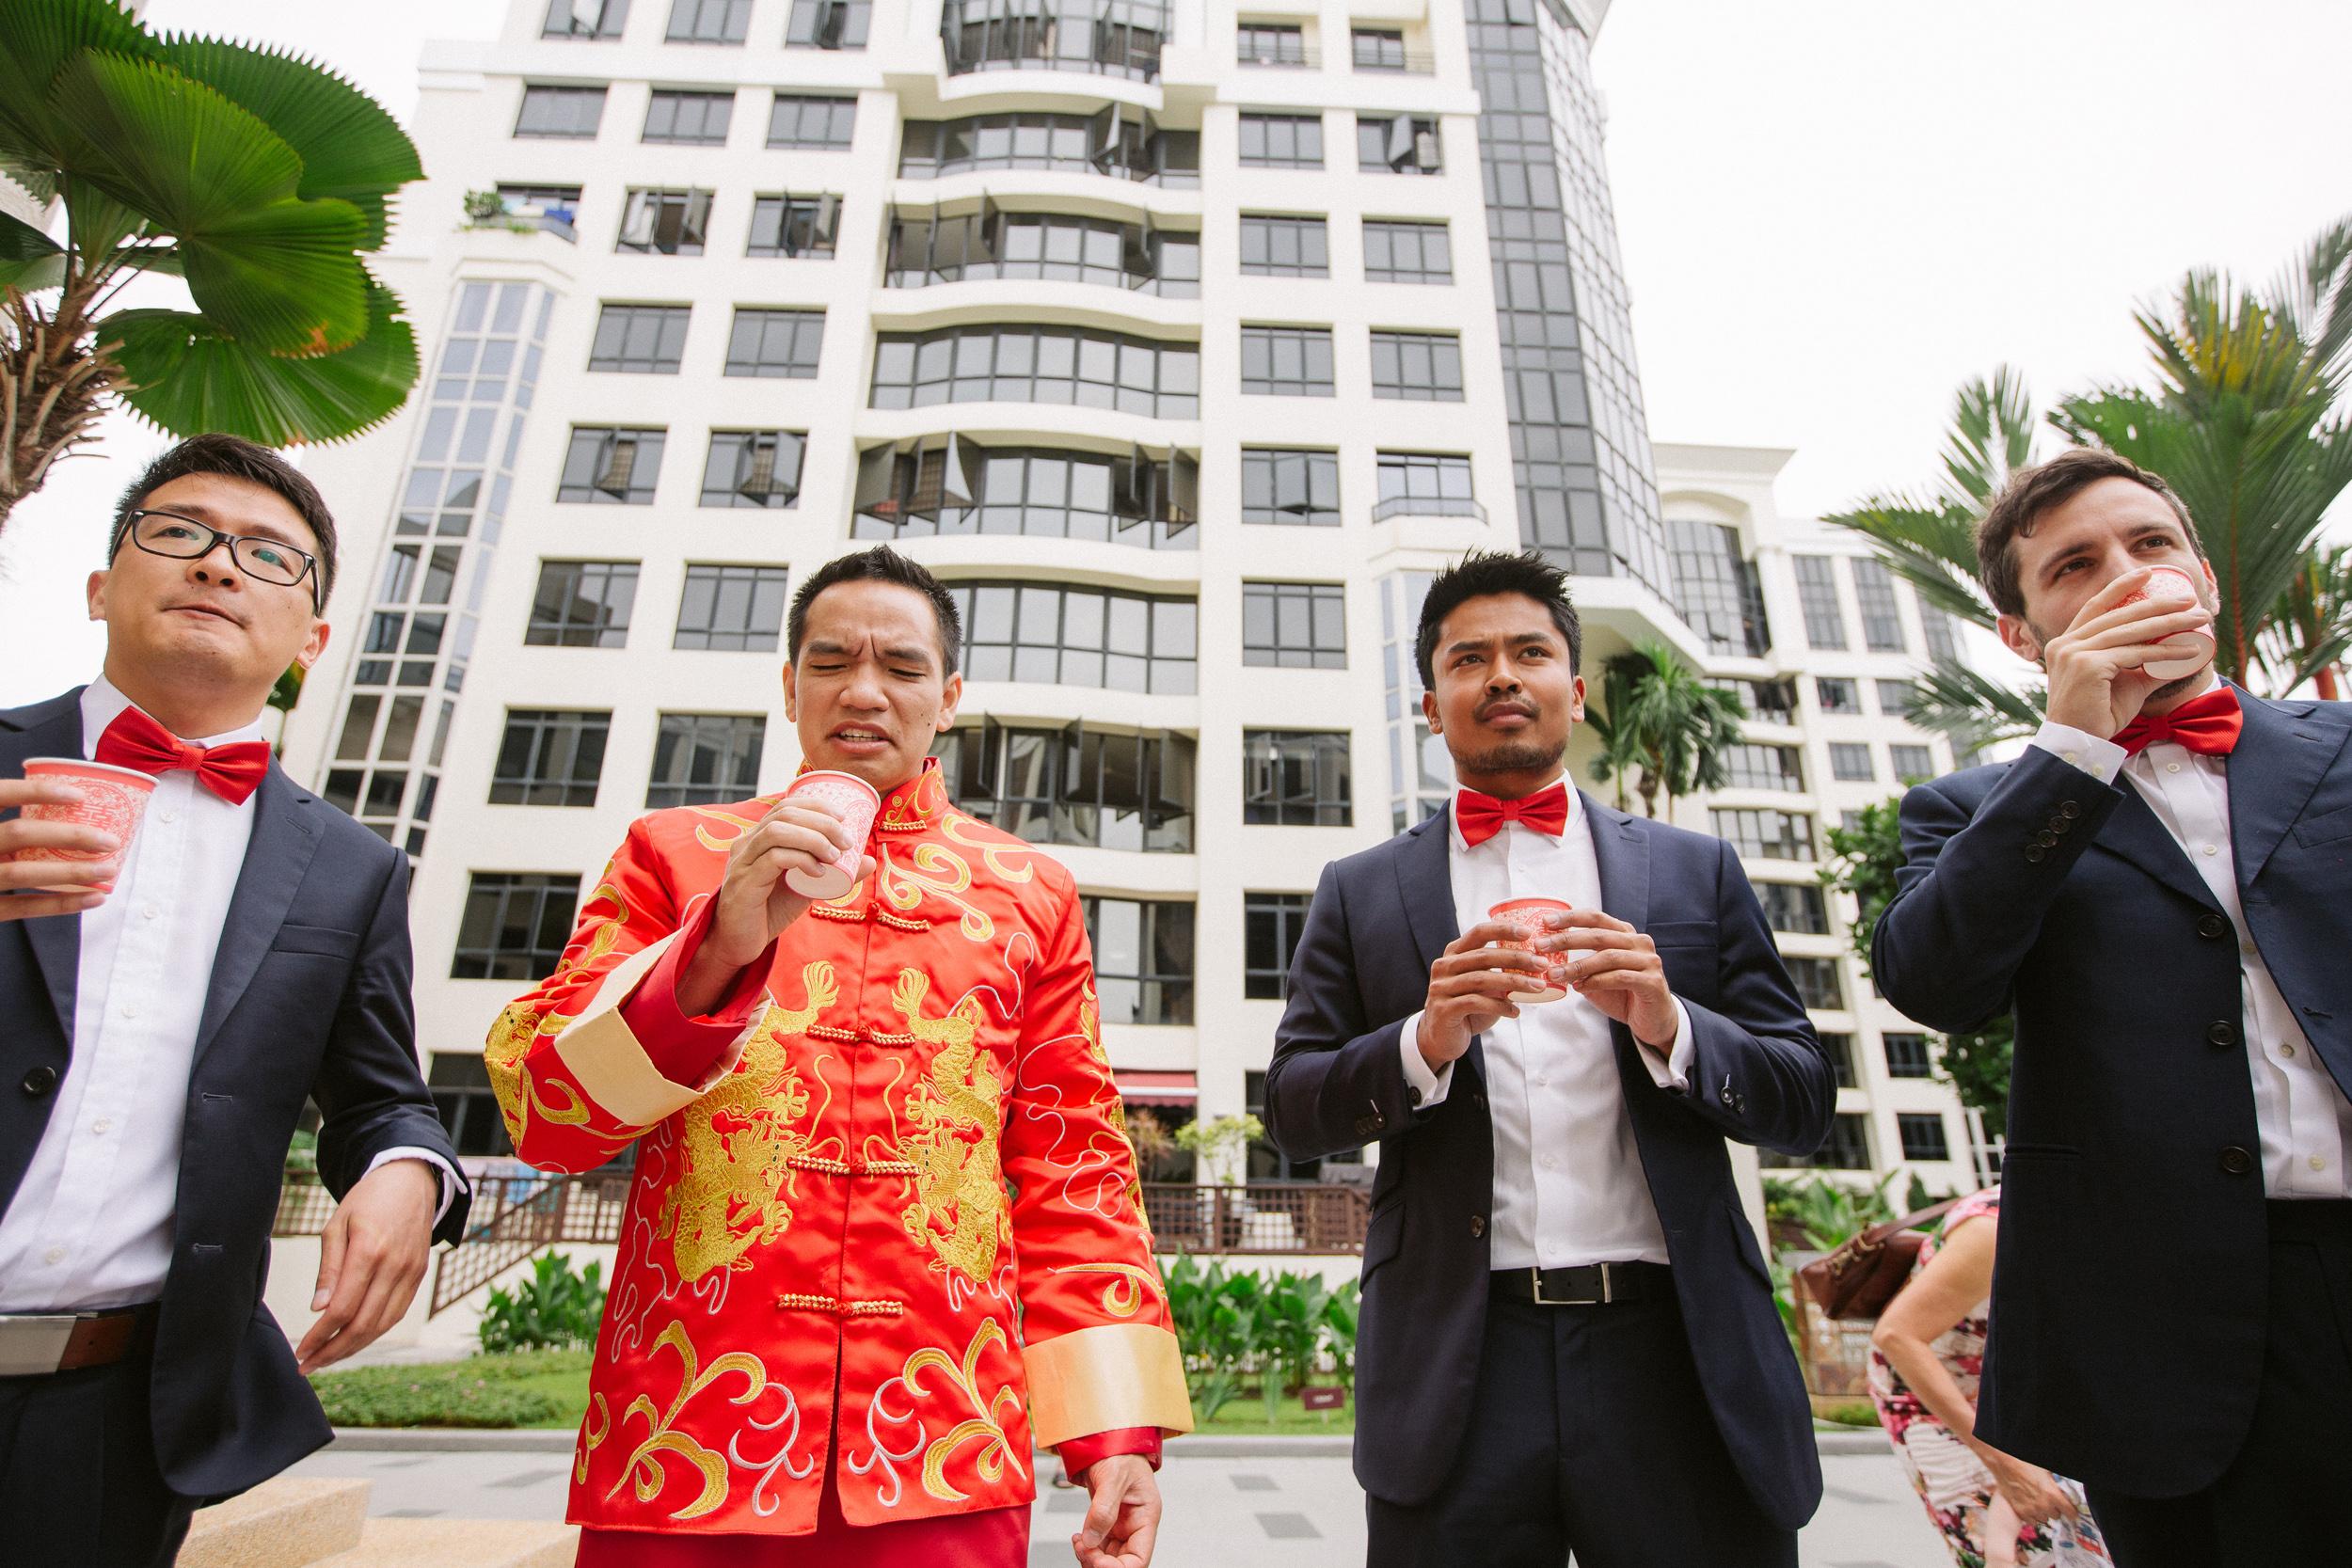 singapore-wedding-photographer-cheryl-matthew-fullerton-hotel-wedding-09.jpg